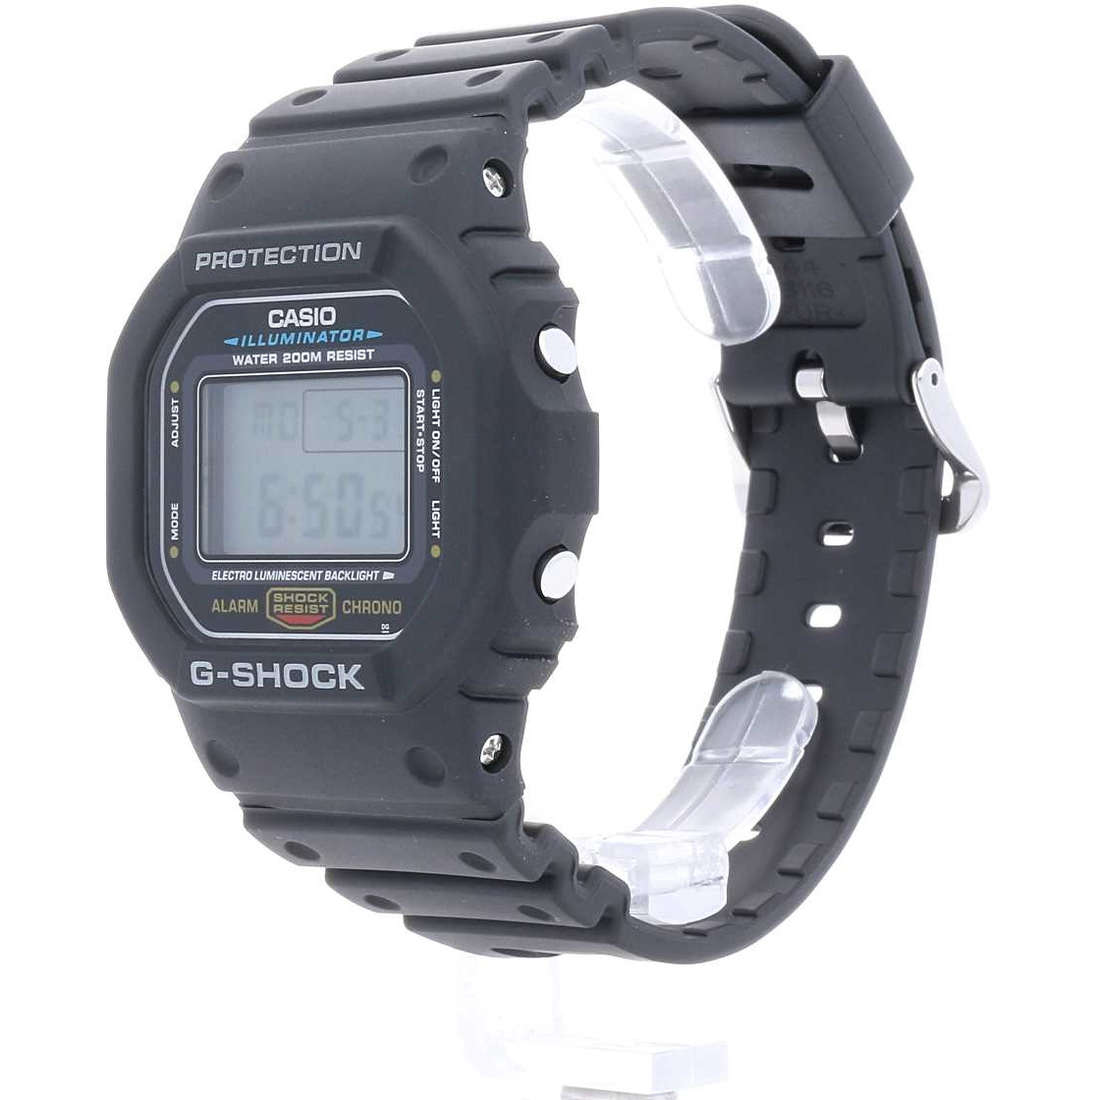 sale watches man Casio DW-5600E-1VER